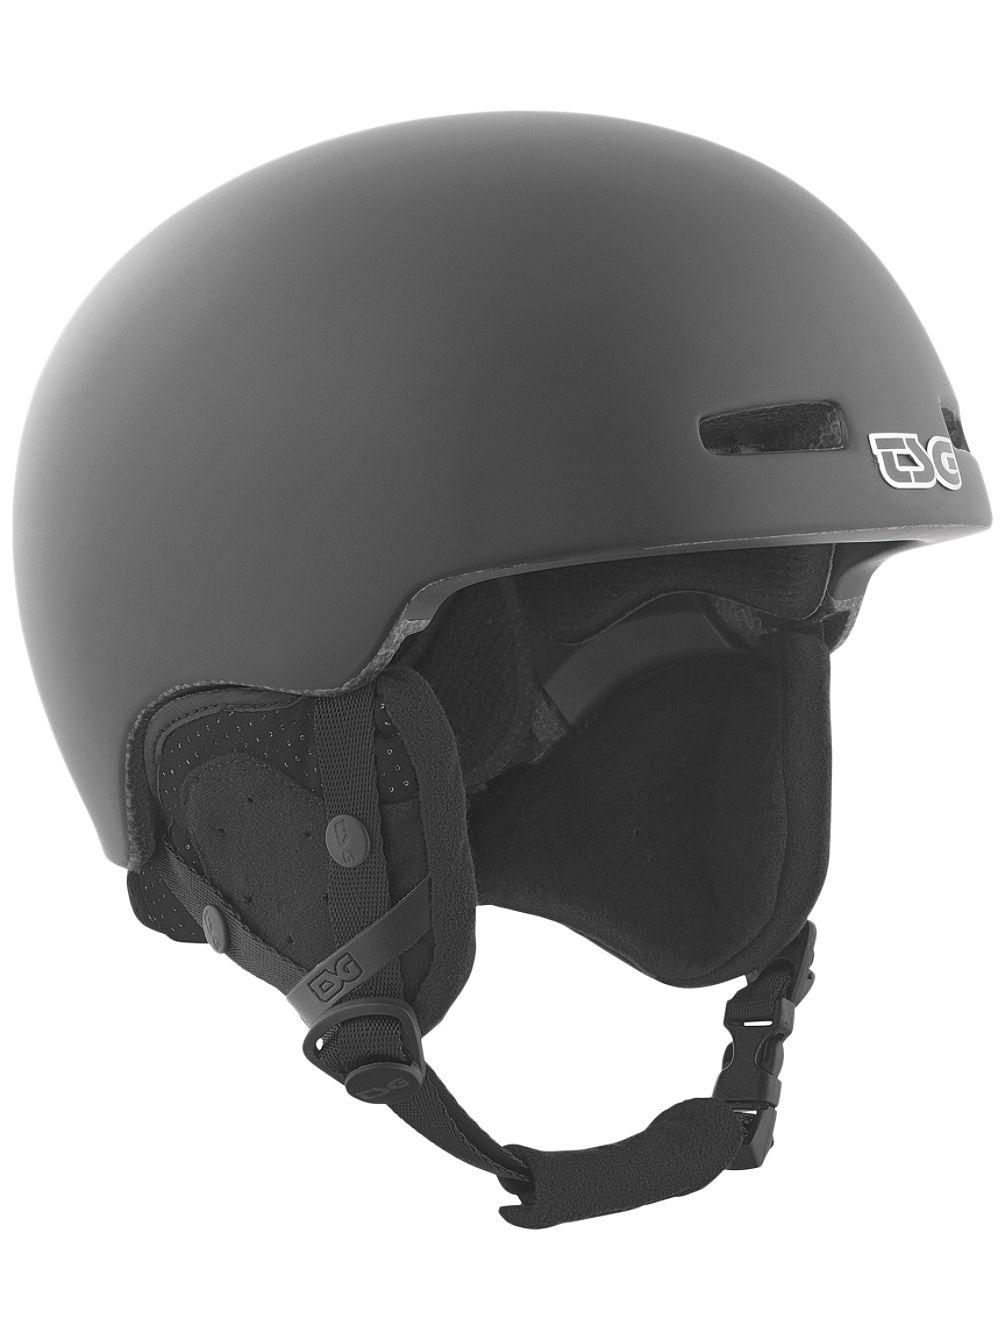 tsg-fly-solid-color-helmet